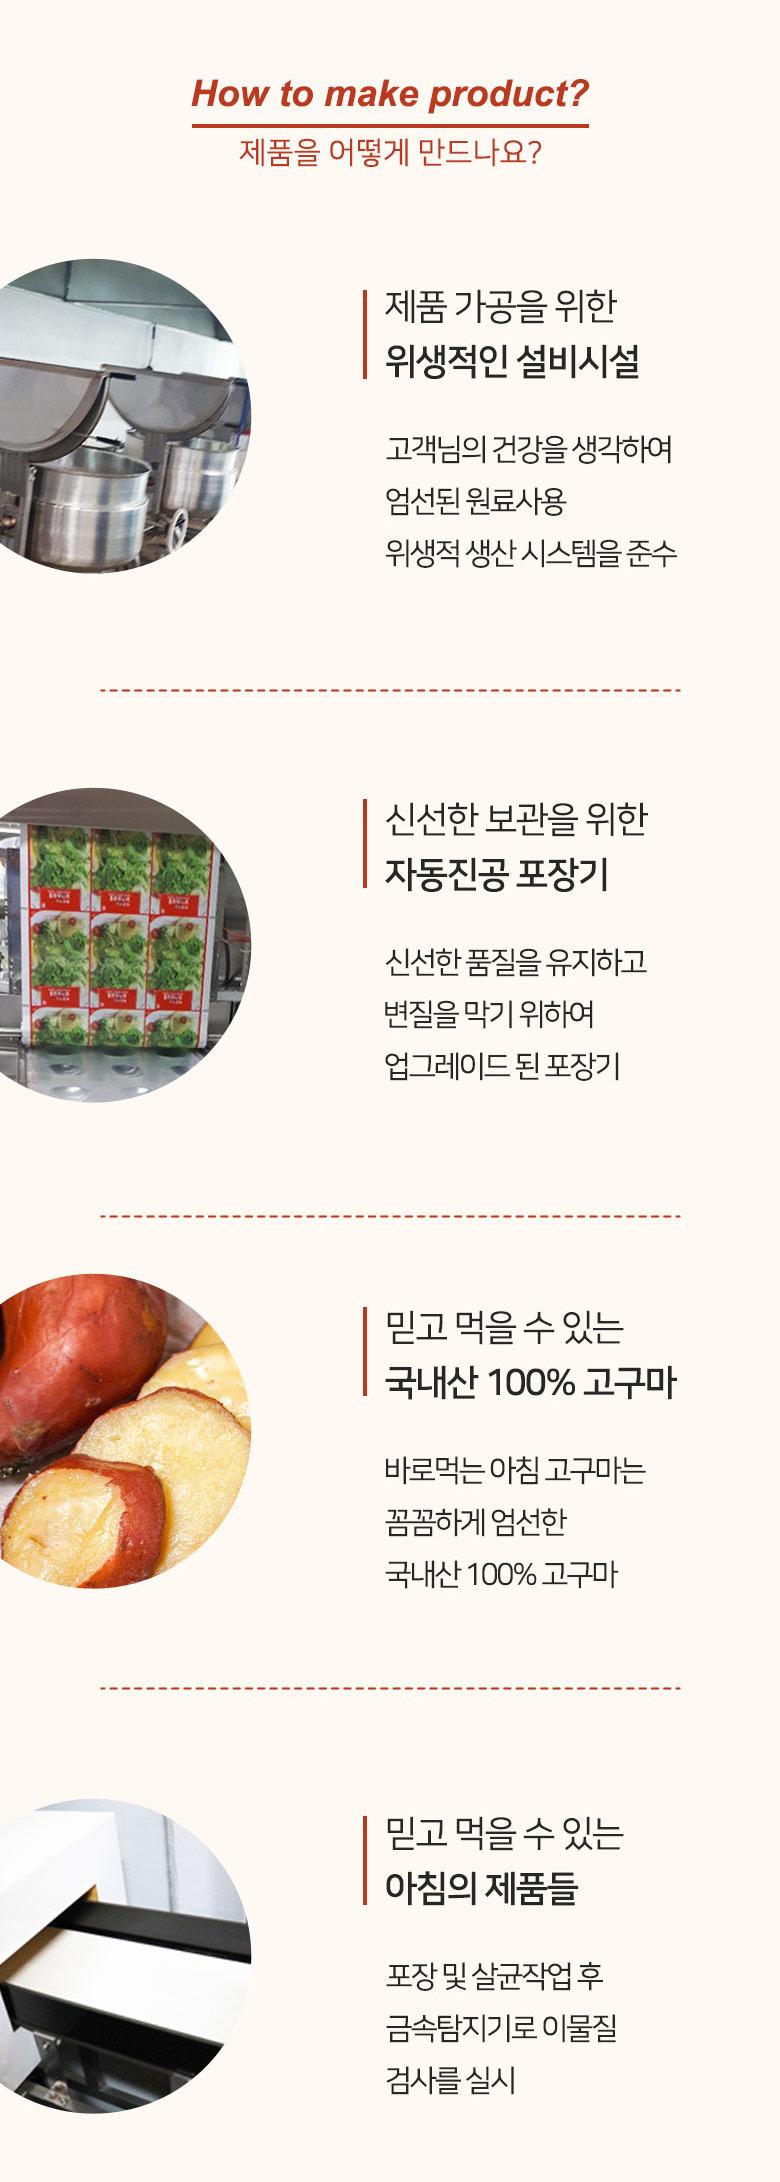 achim_sweetpotato_slice_07_shop1_175022.jpg